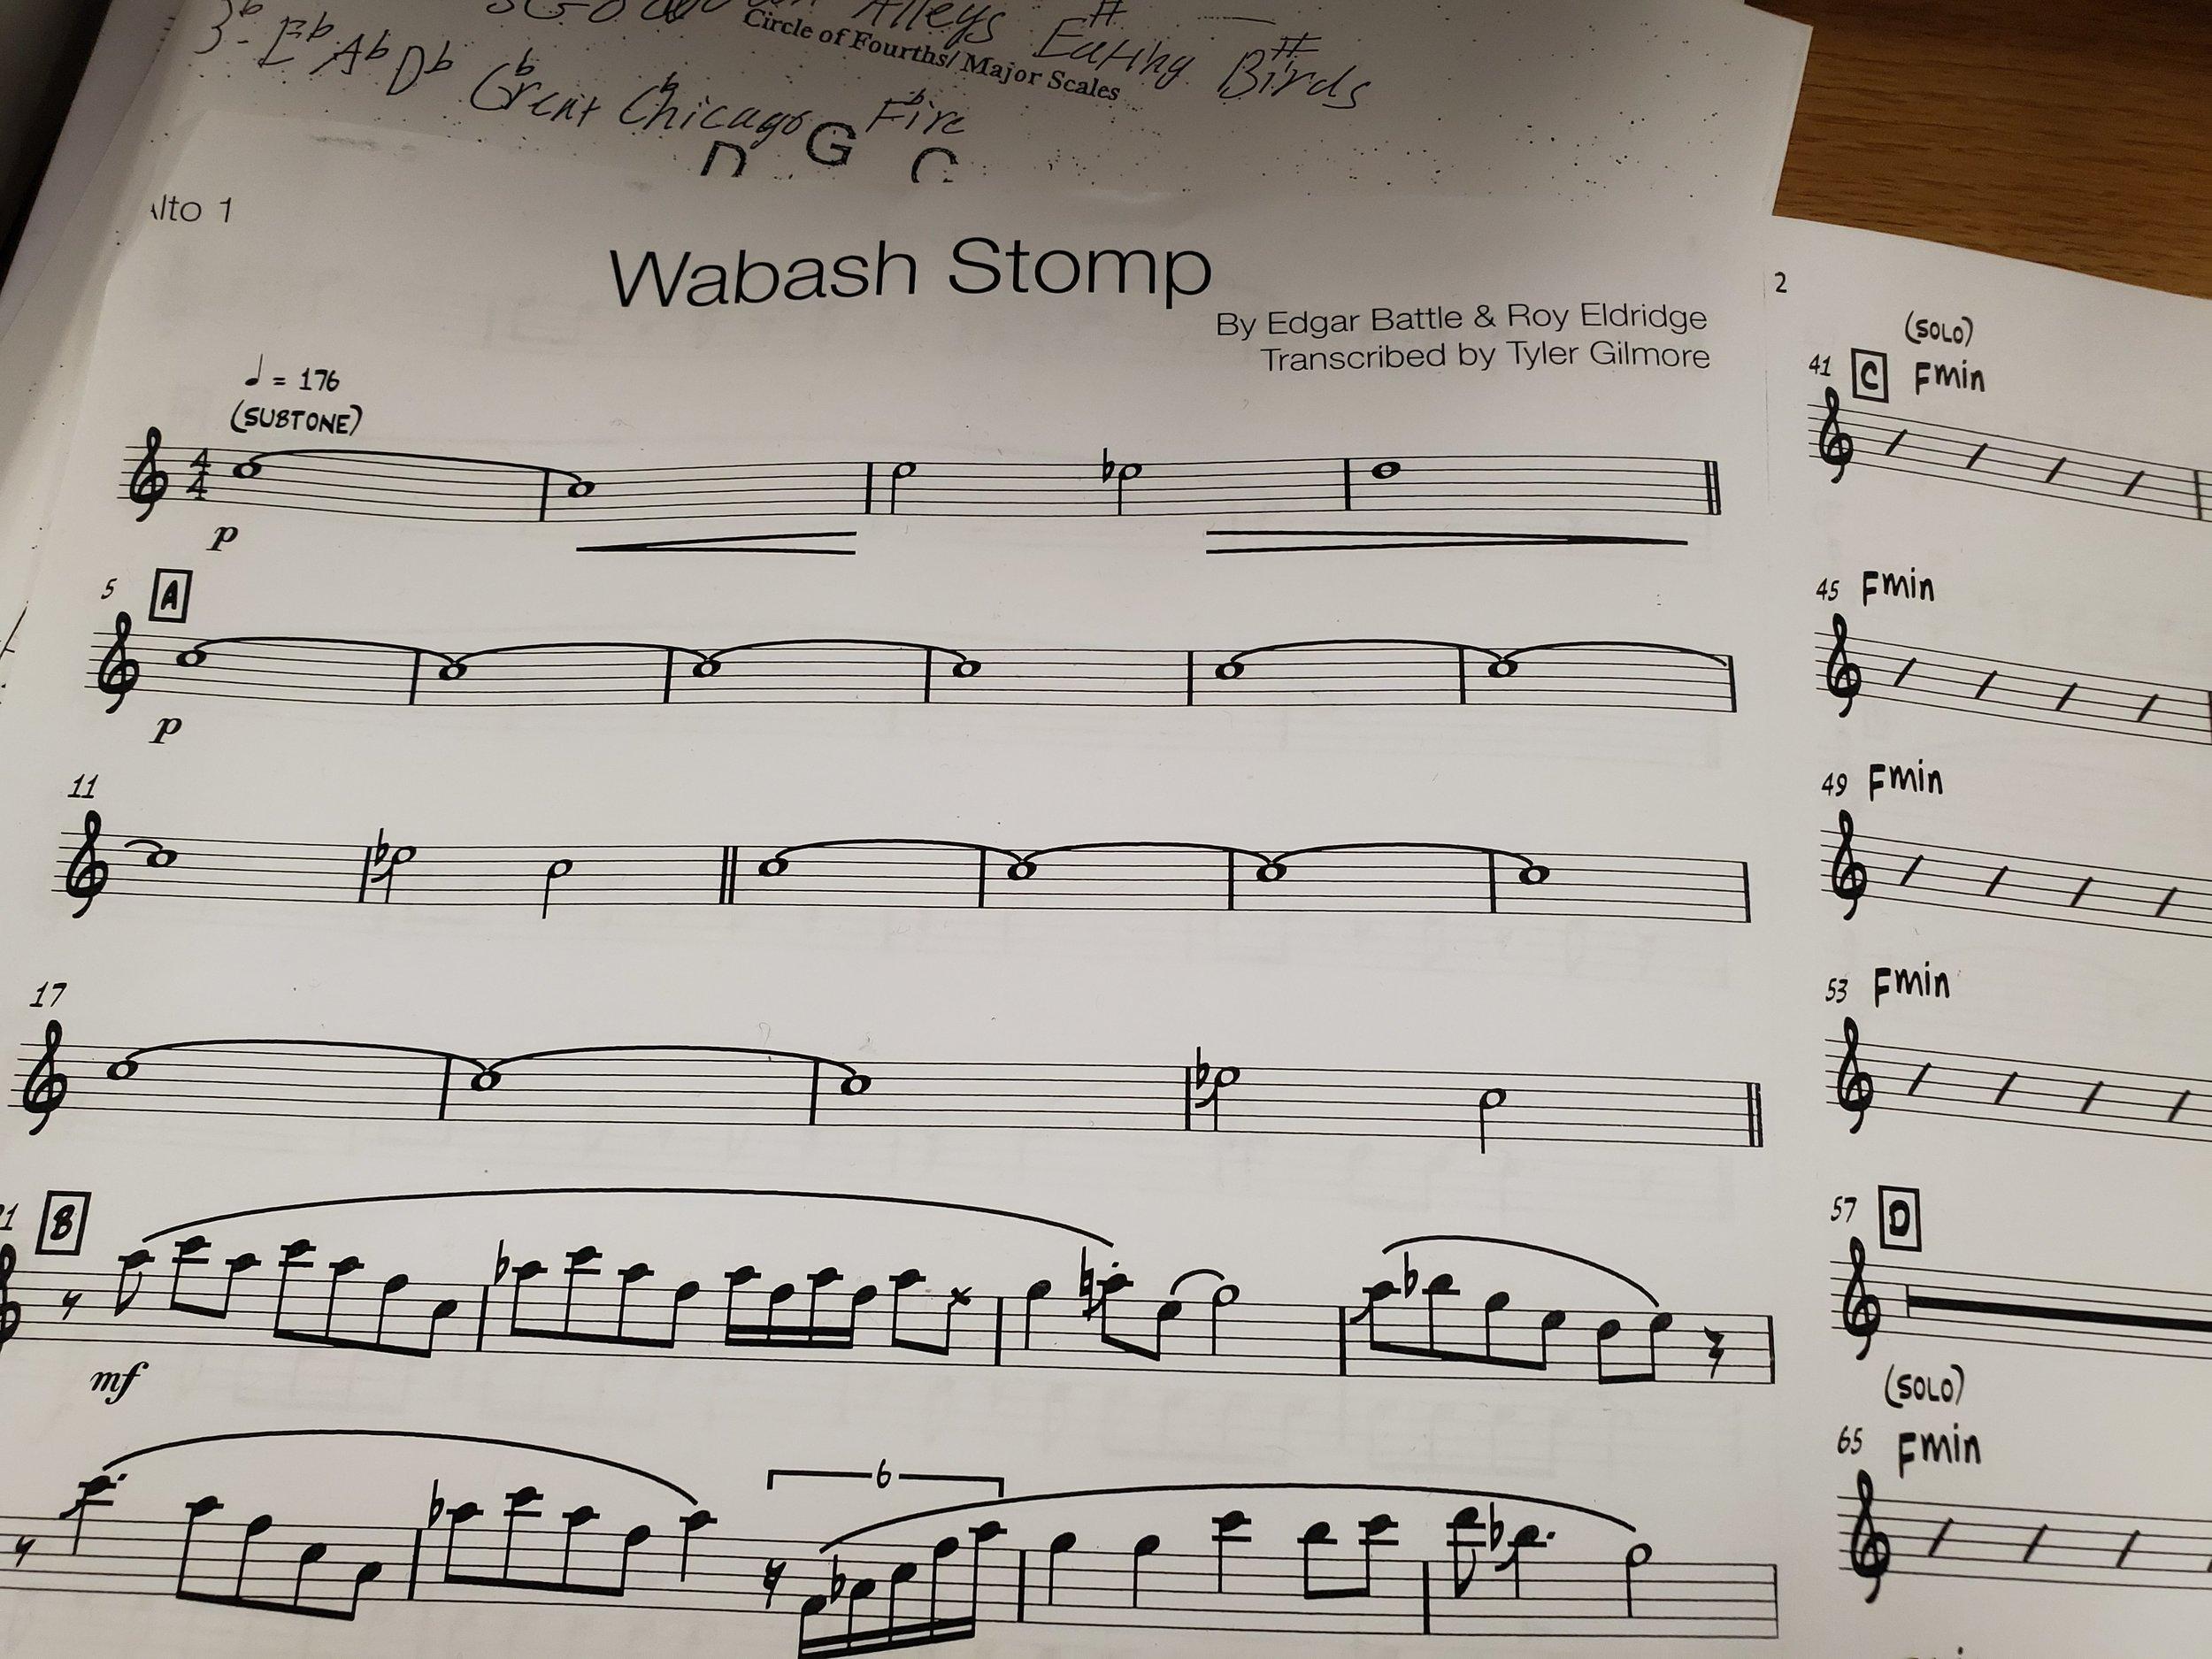 Sheet music for Wabash Stomp